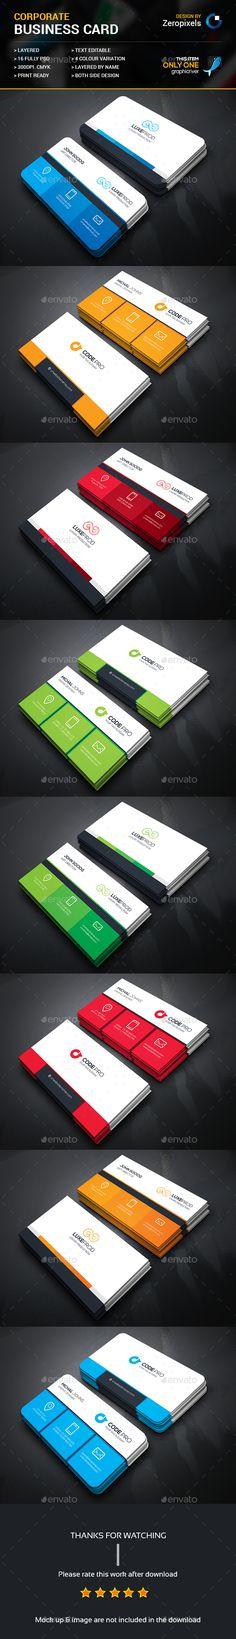 Corporate Business Card Template PSD Bundle. Download here: http://graphicriver.net/item/corporate-business-card-bundle/16769808?ref=ksioks